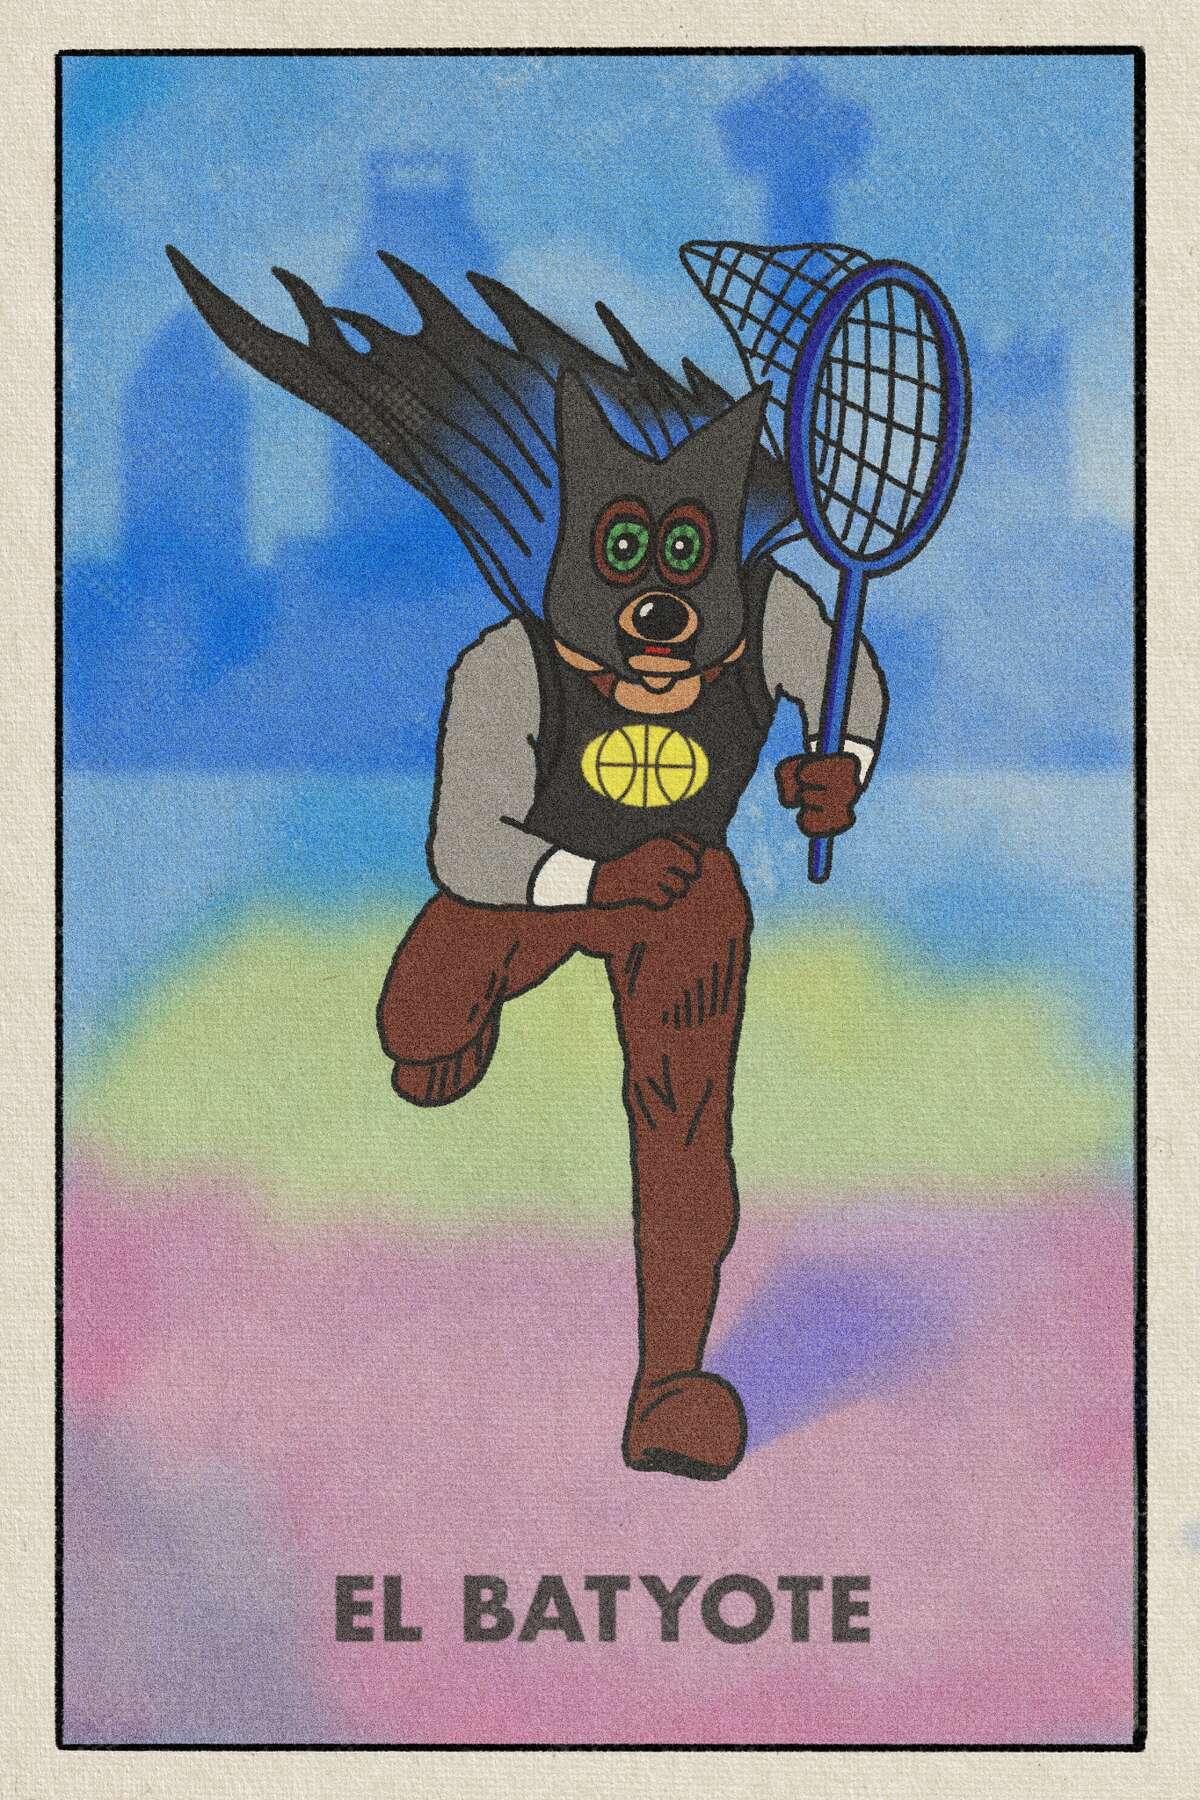 Alternate Spurs mascot